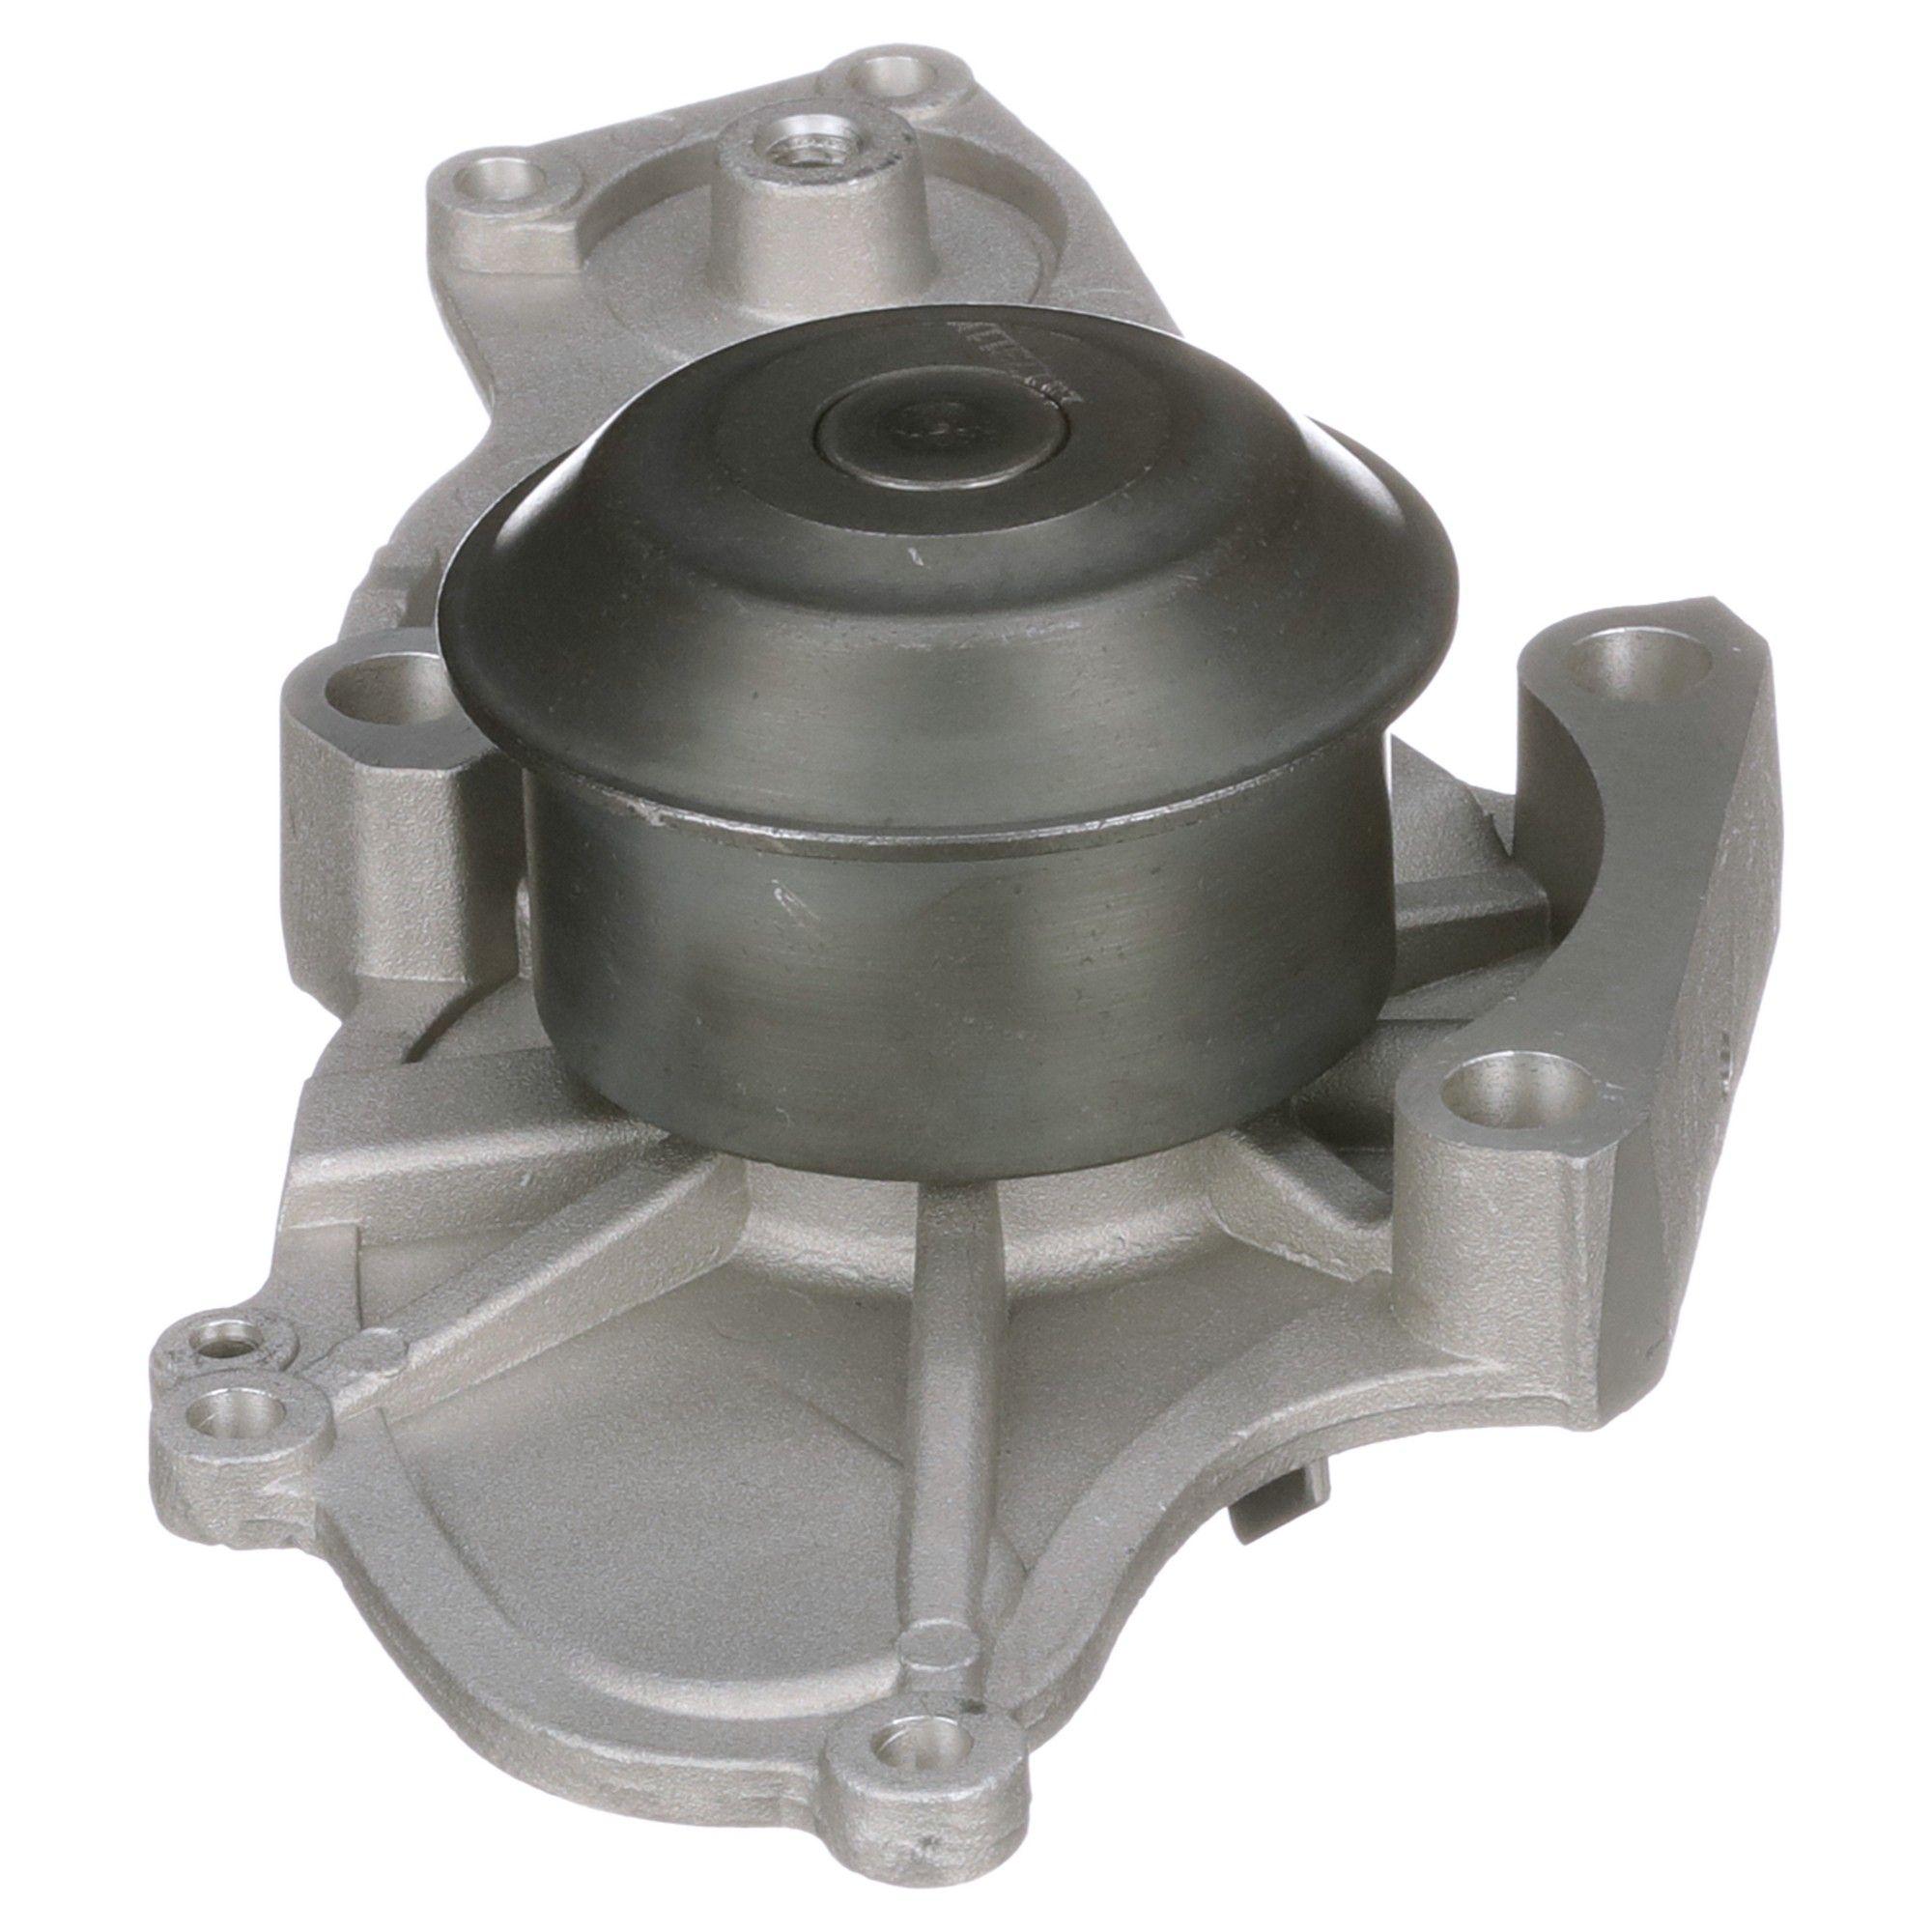 Honda Accord Engine Water Pump Replacement (AISIN, Airtex